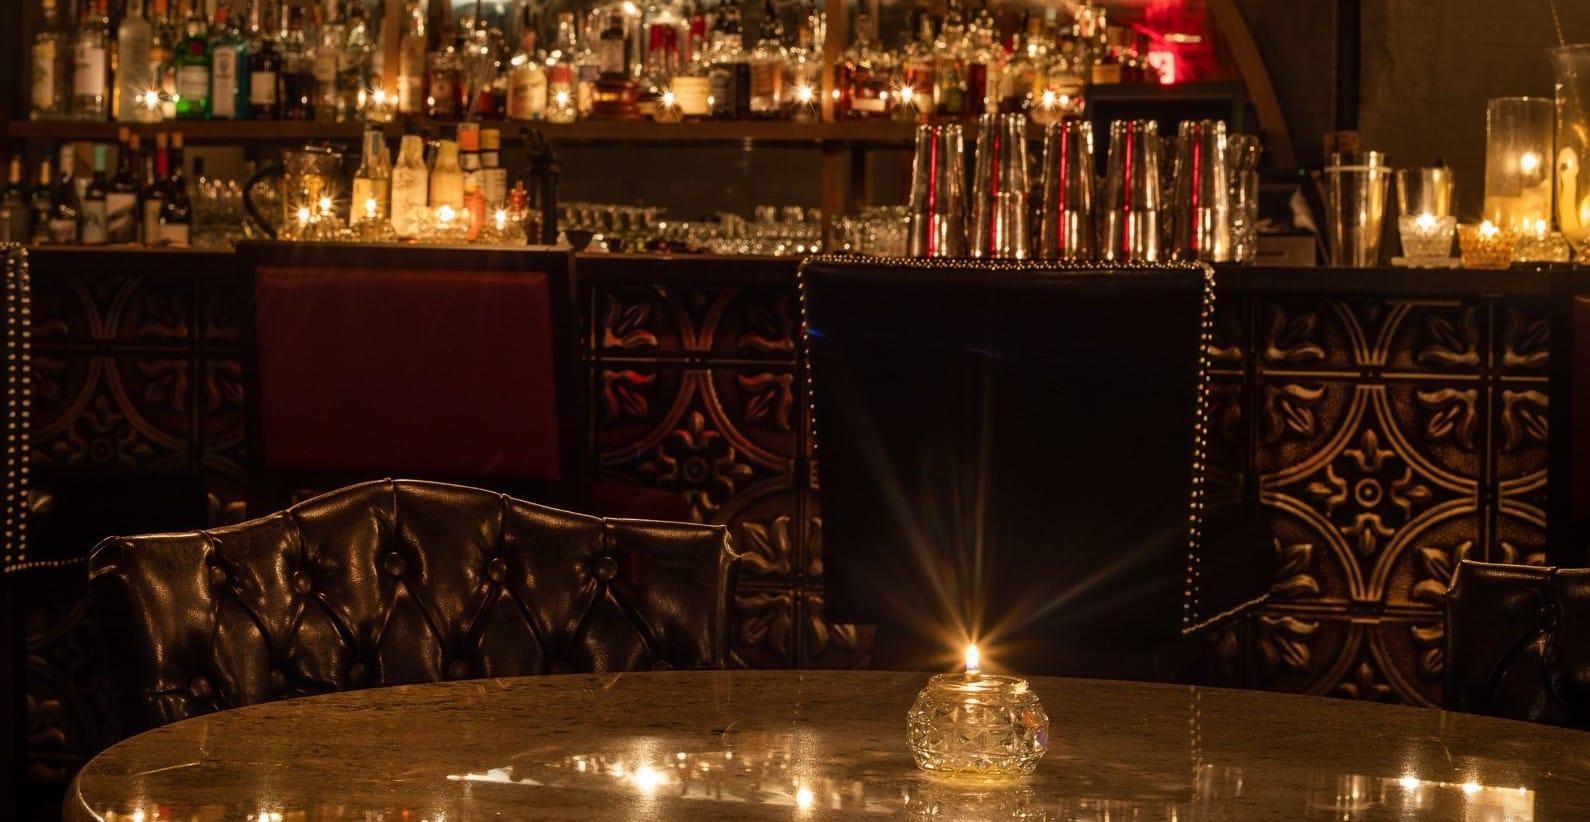 Most Romantic Restaurants In Wichita